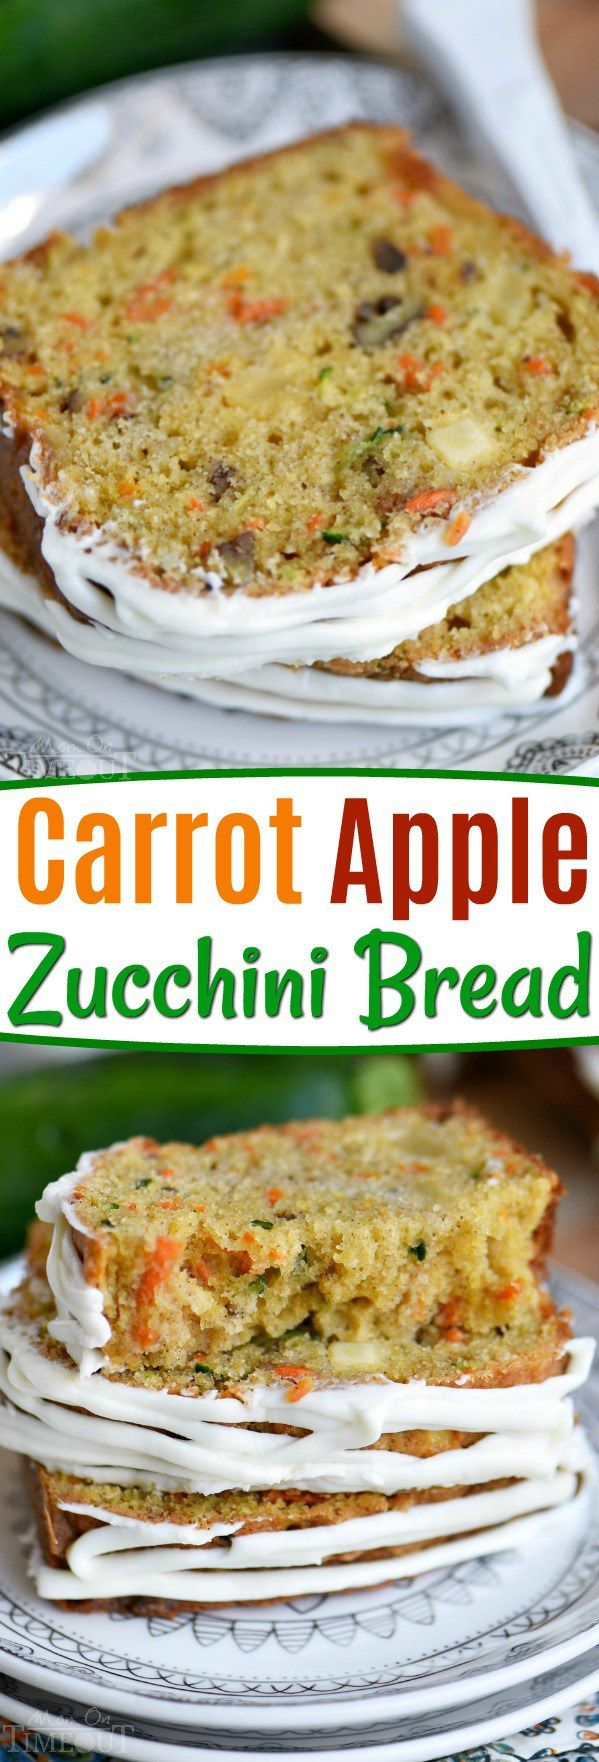 Carrot Apple Zucchini Bread is part of Zucchini bread recipes - Fresh orange juice in the Carrot Apple Zucchini Bread recipe makes it moist and flavorful